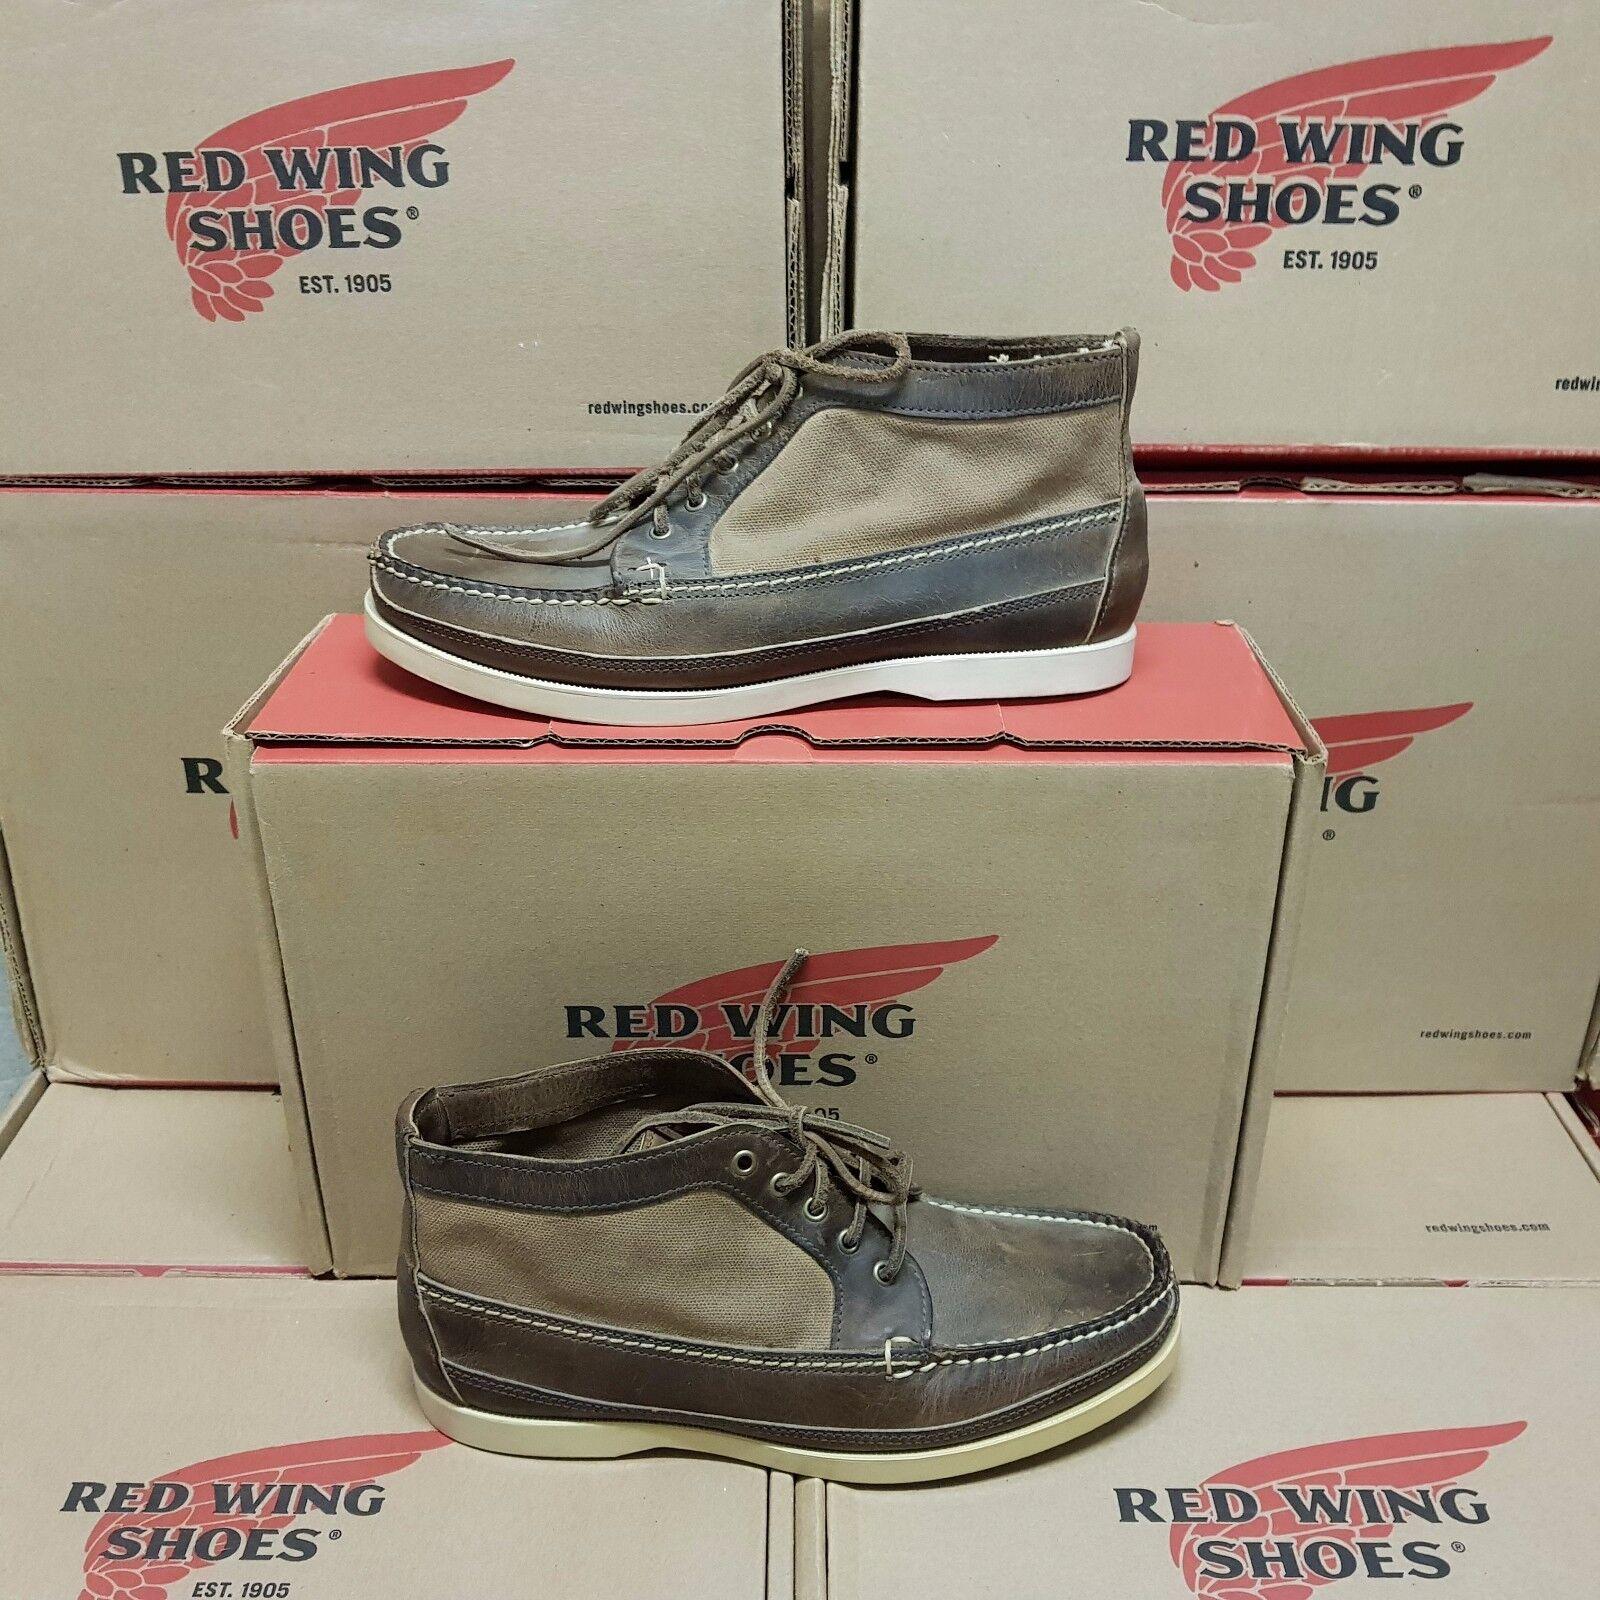 nuovo sadico RED RED RED WING scarpe 9191 Chukka Concrete uomo stivali US 8,5 EUR 41,5 (pv 319 )  negozio outlet